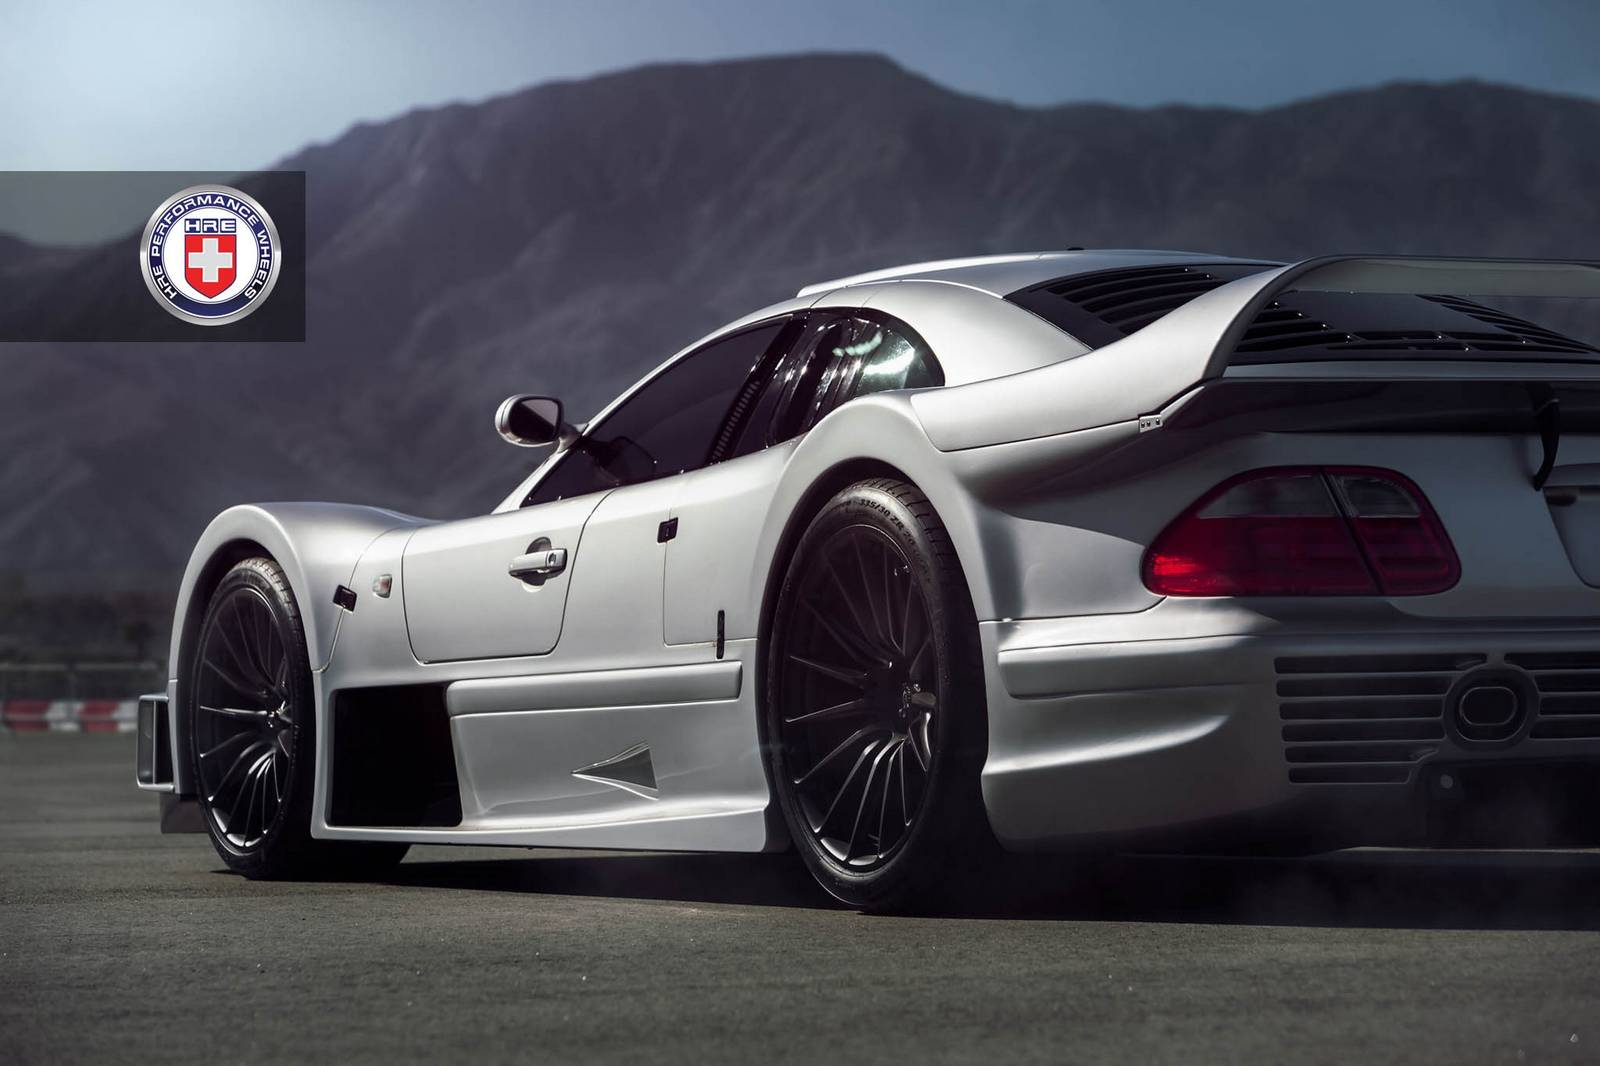 Stunning mercedes benz clk gtr with satin black hre wheels for Mercedes benz r